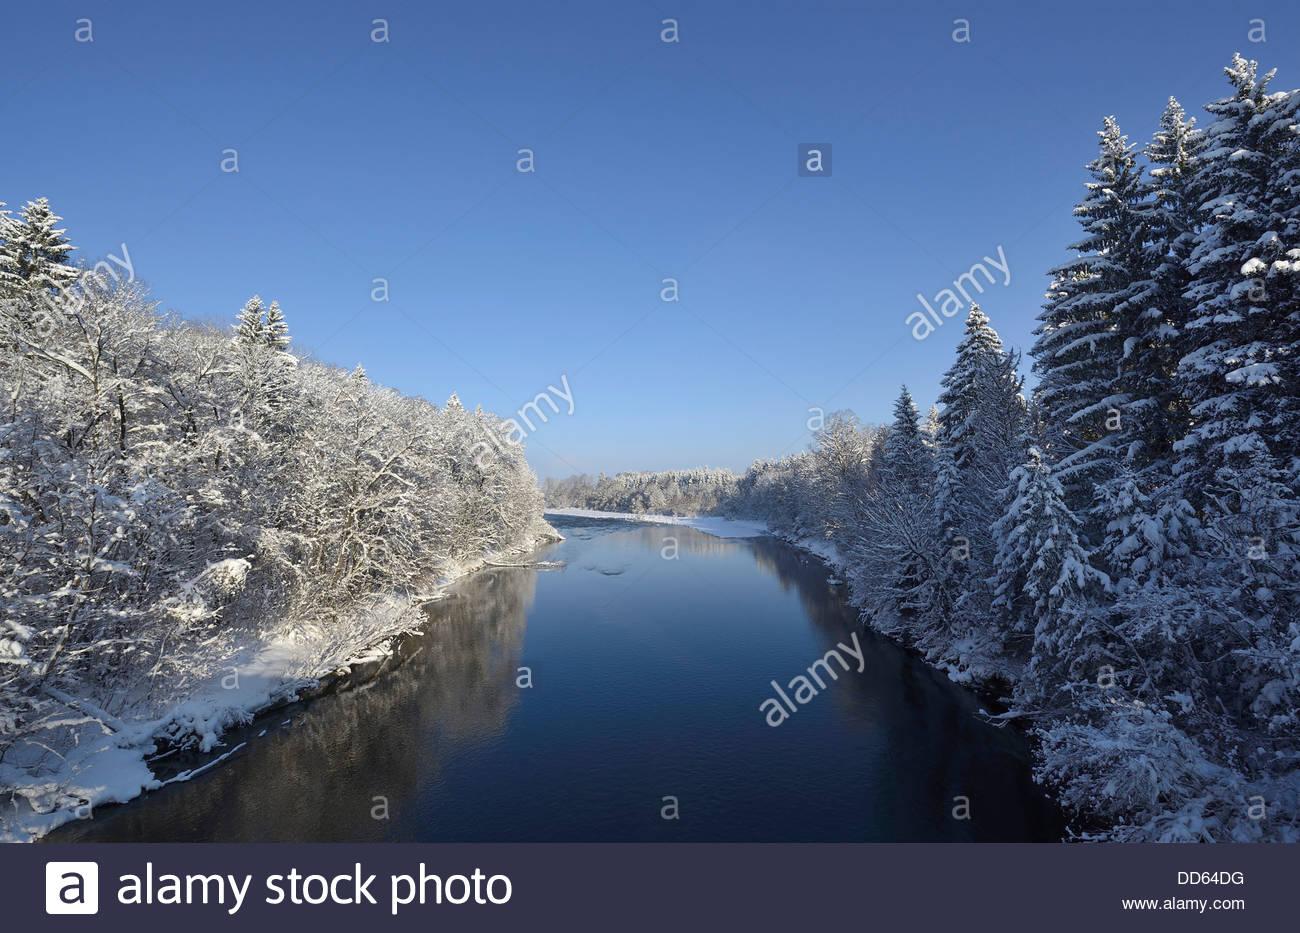 Germany, Bavaria,View of Isar River Stock Photo